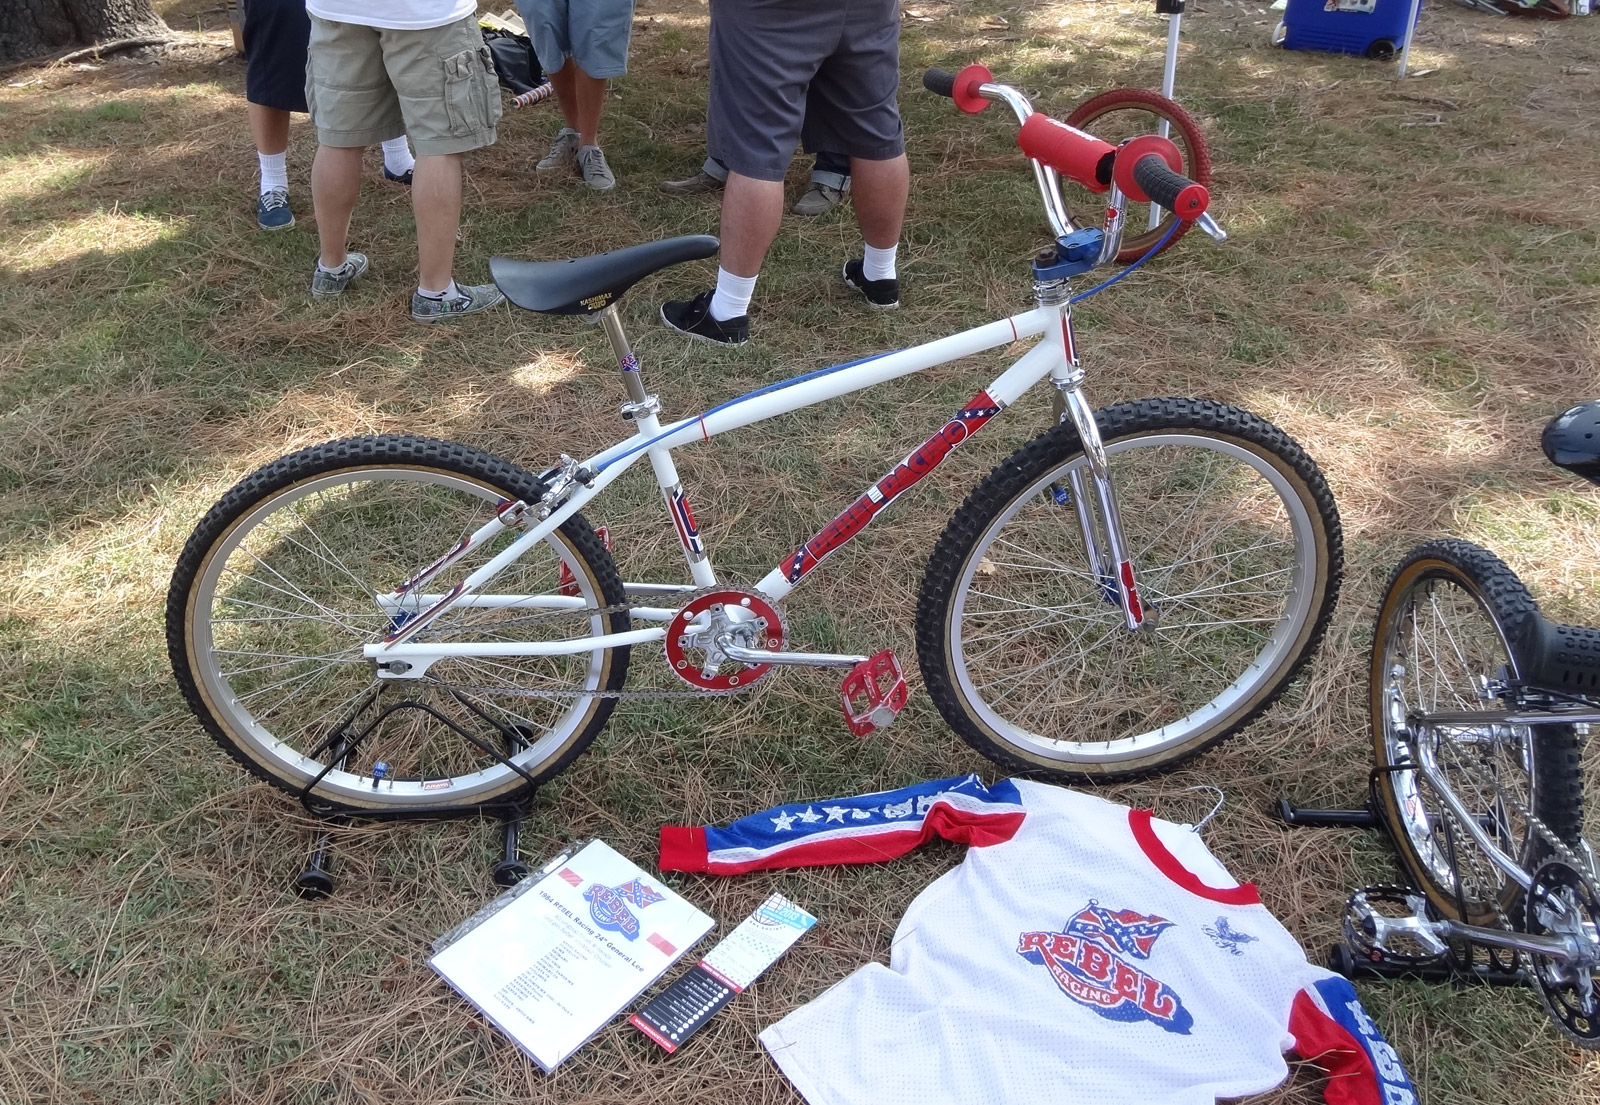 https://s3.amazonaws.com/uploads.bmxmuseum.com/user-images/8916/bikes435b7dc285de.jpg